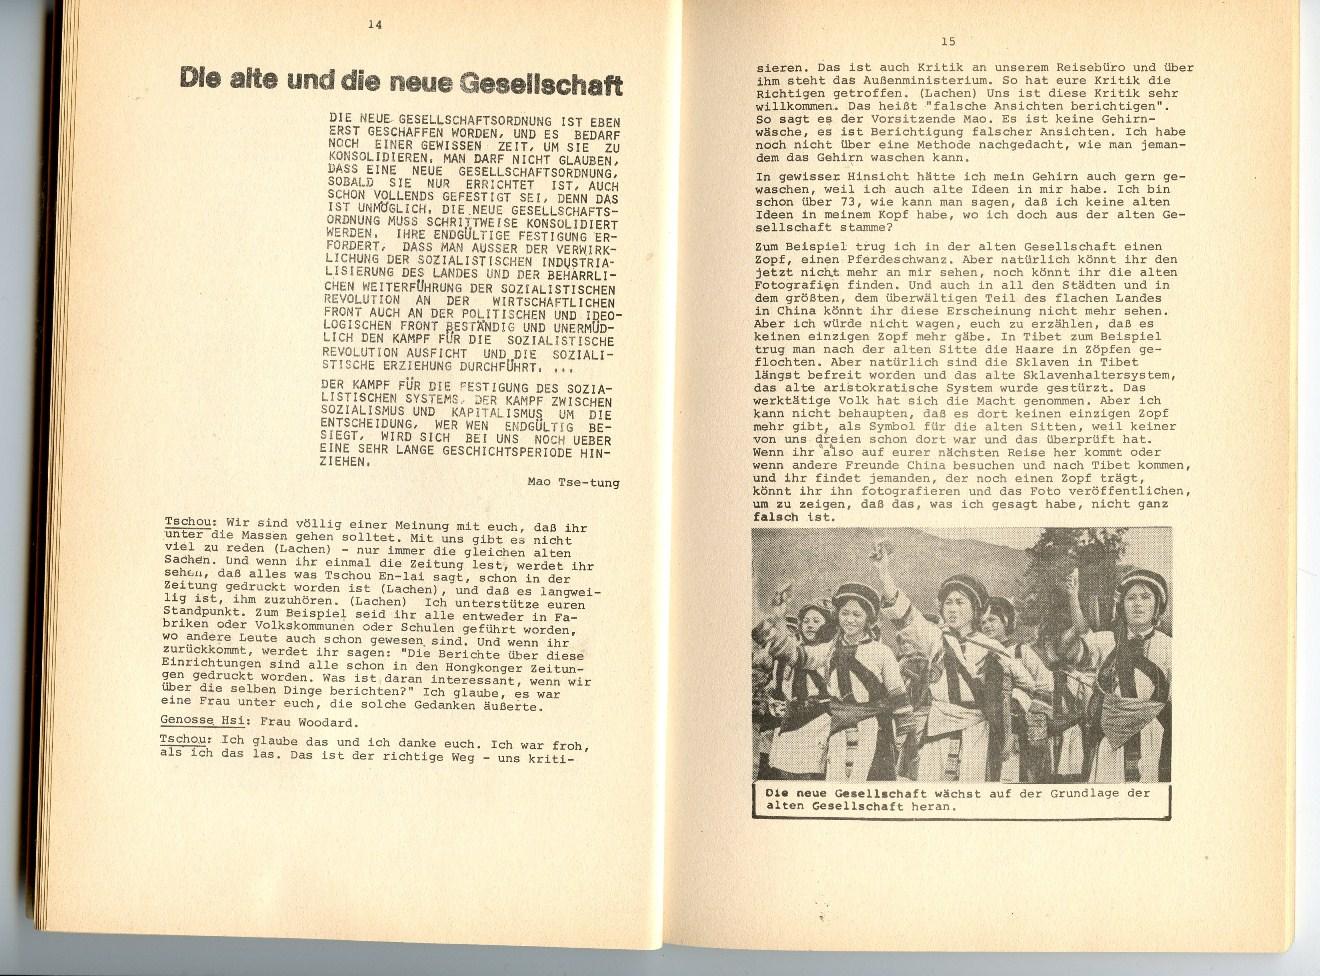 ZB_VRChina_Bollwerk_1971_09